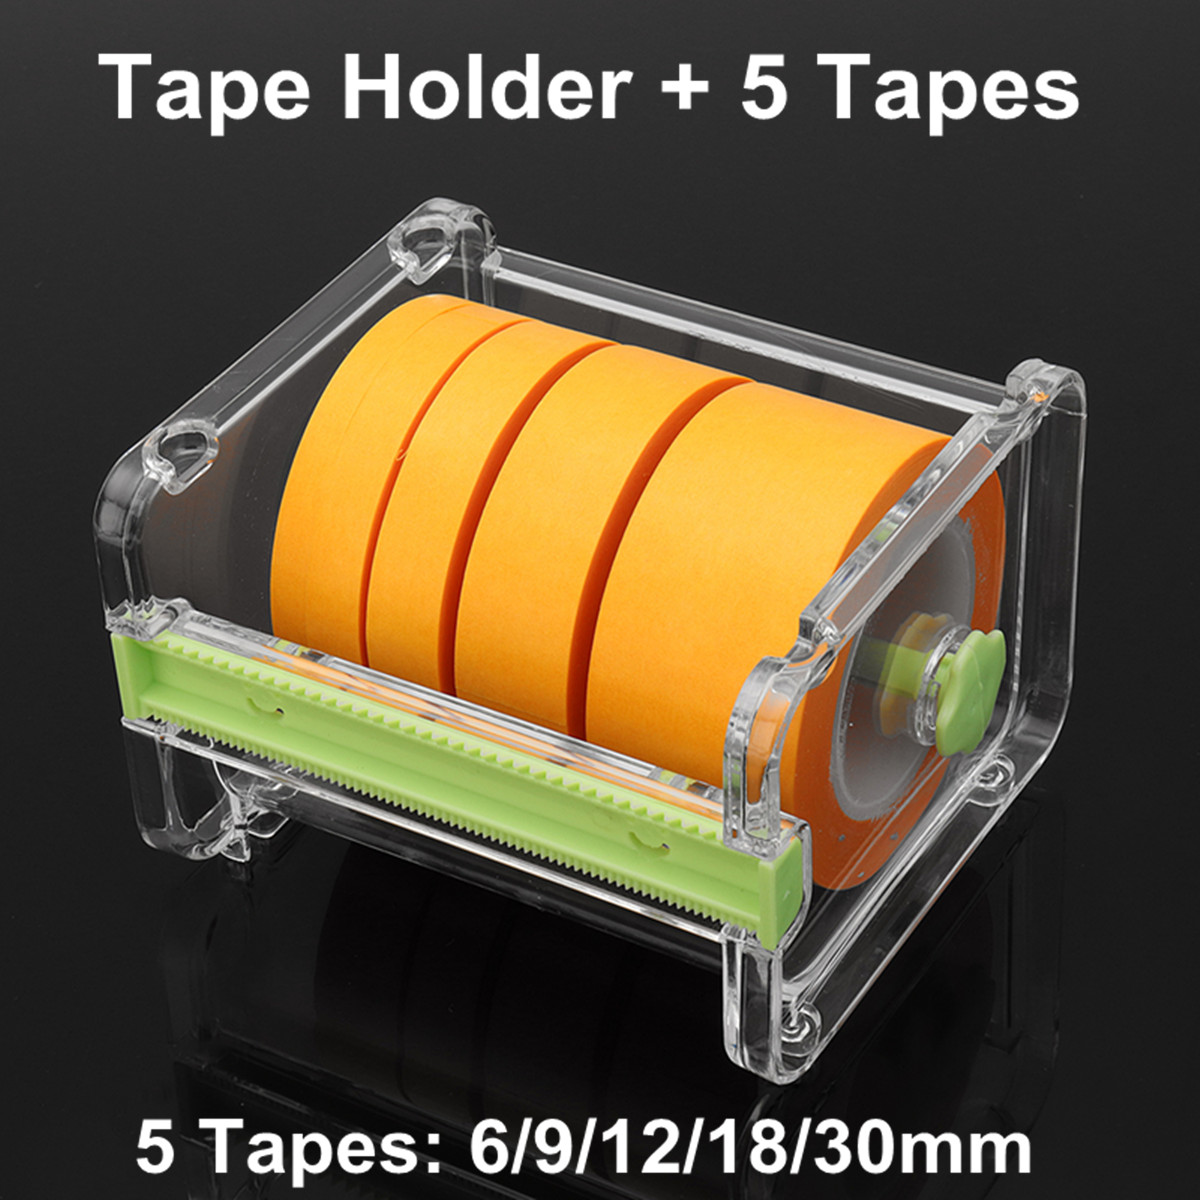 Adhesive Tape Dispenser Plastic Transparent With Tape Cutter Office Desktop Tape Holder Organizer+5 Tapes